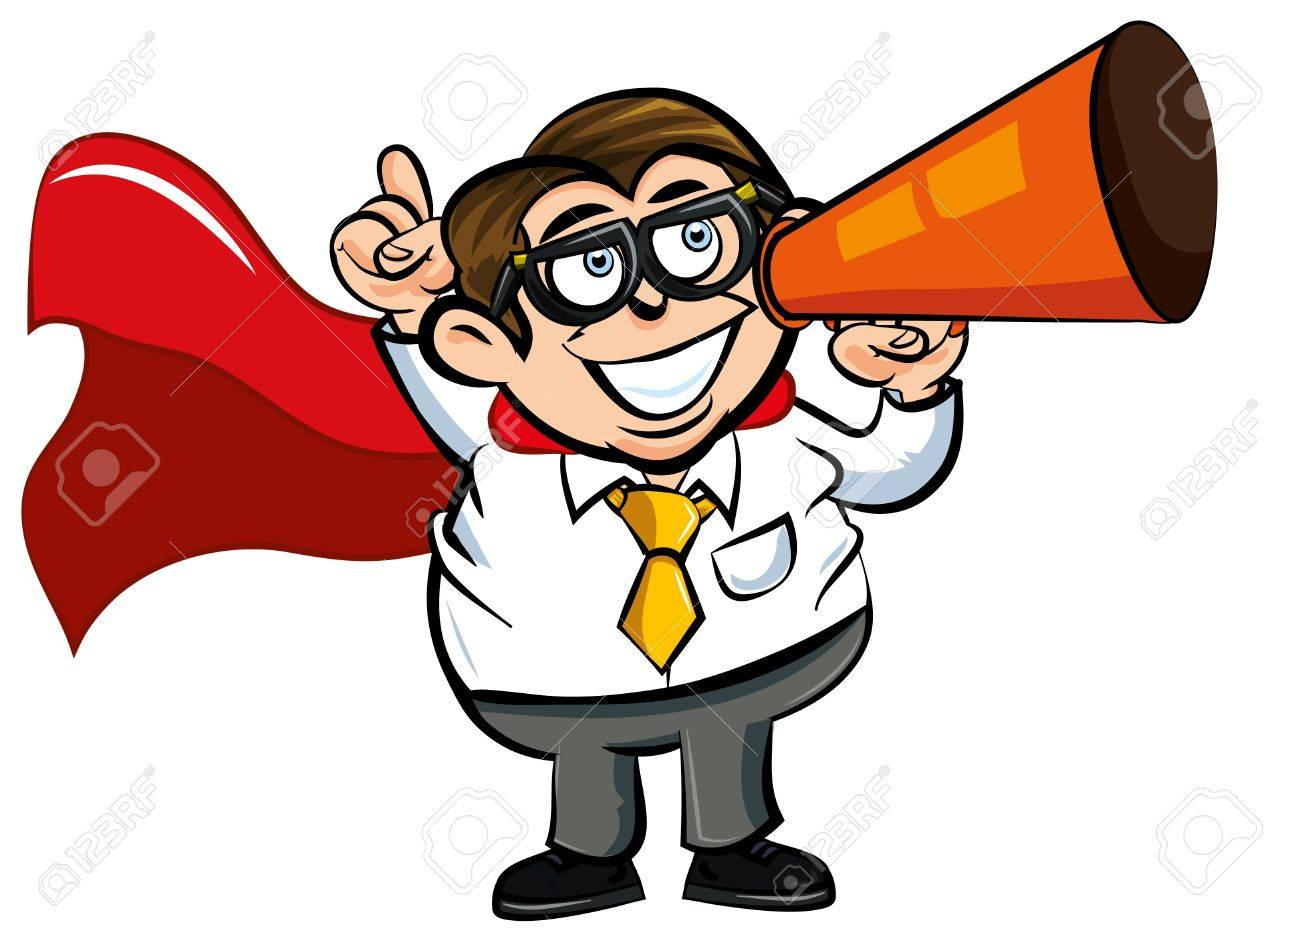 1300x951 Cartoon Superhero Office Nerd With Cape And Megaphone Royalty Free